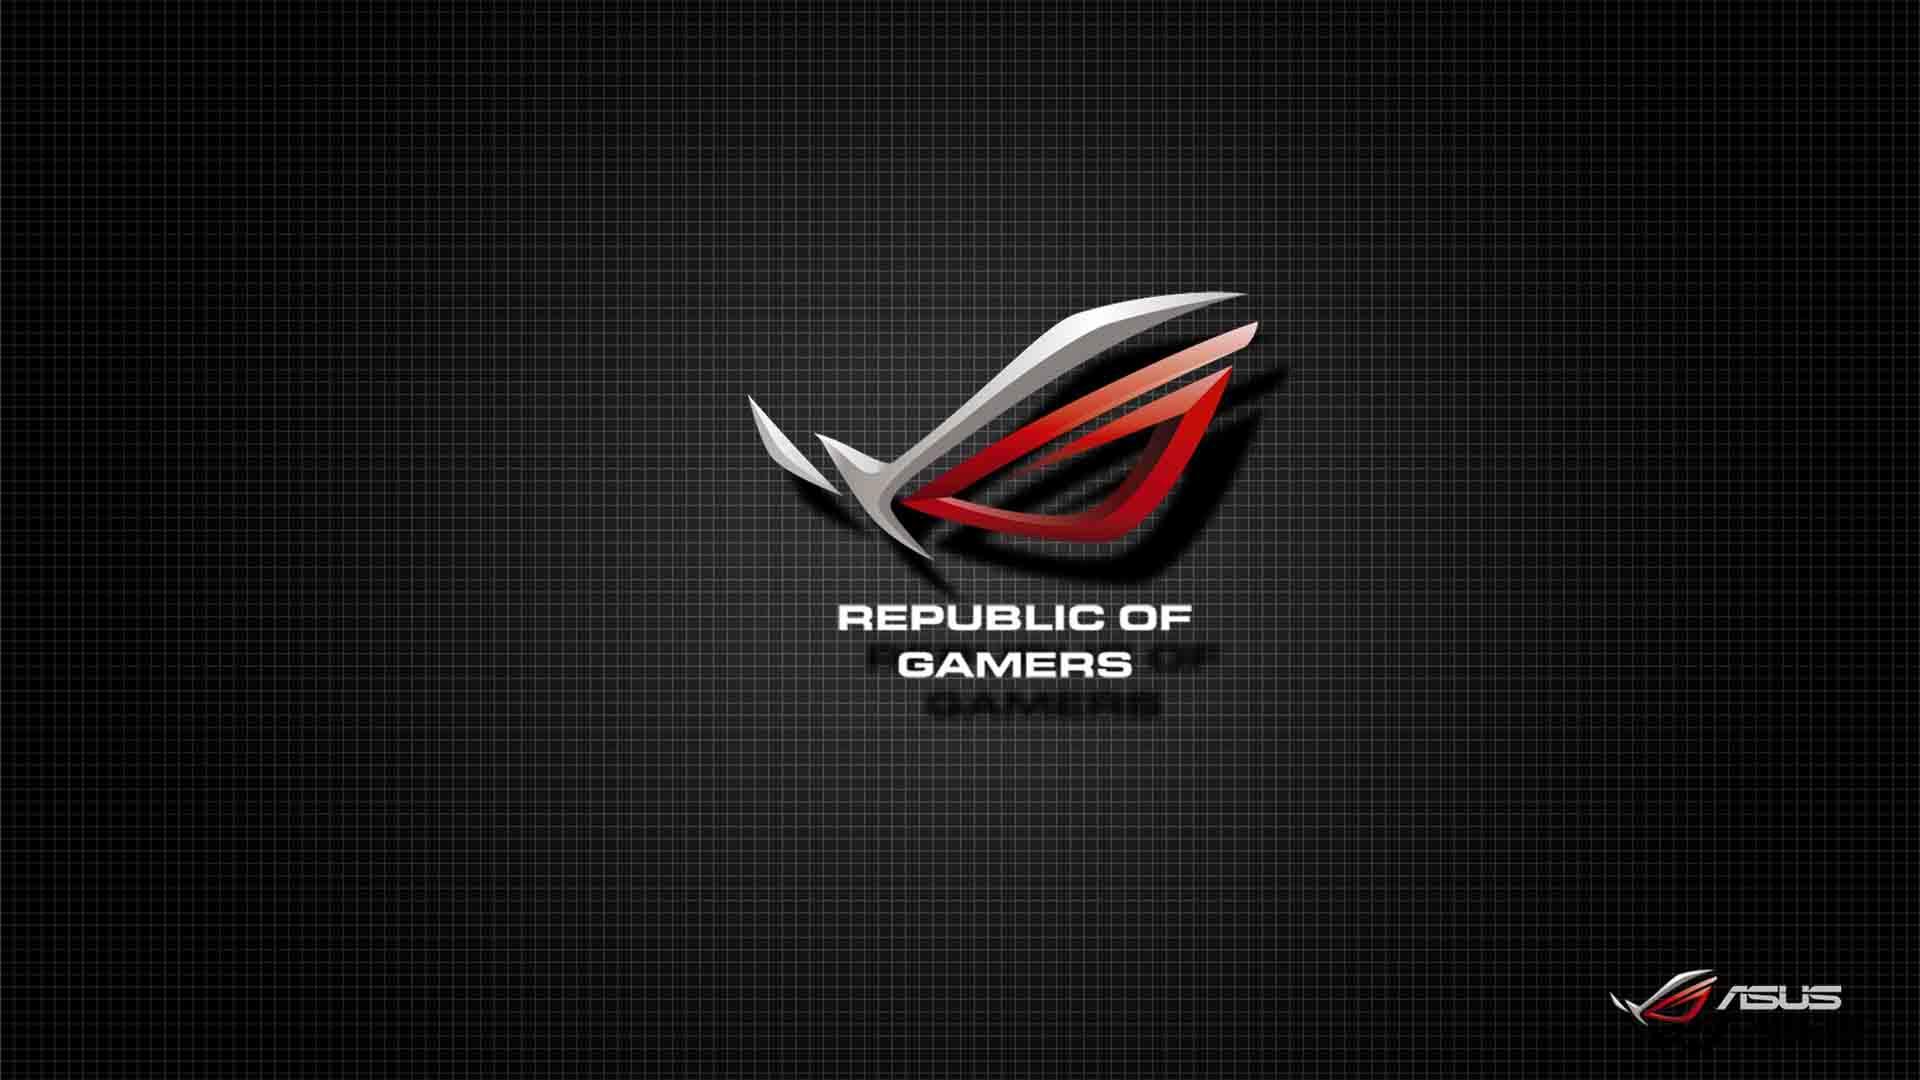 Asus Republic Of Gamers wallpapers HD   412702 1920x1080